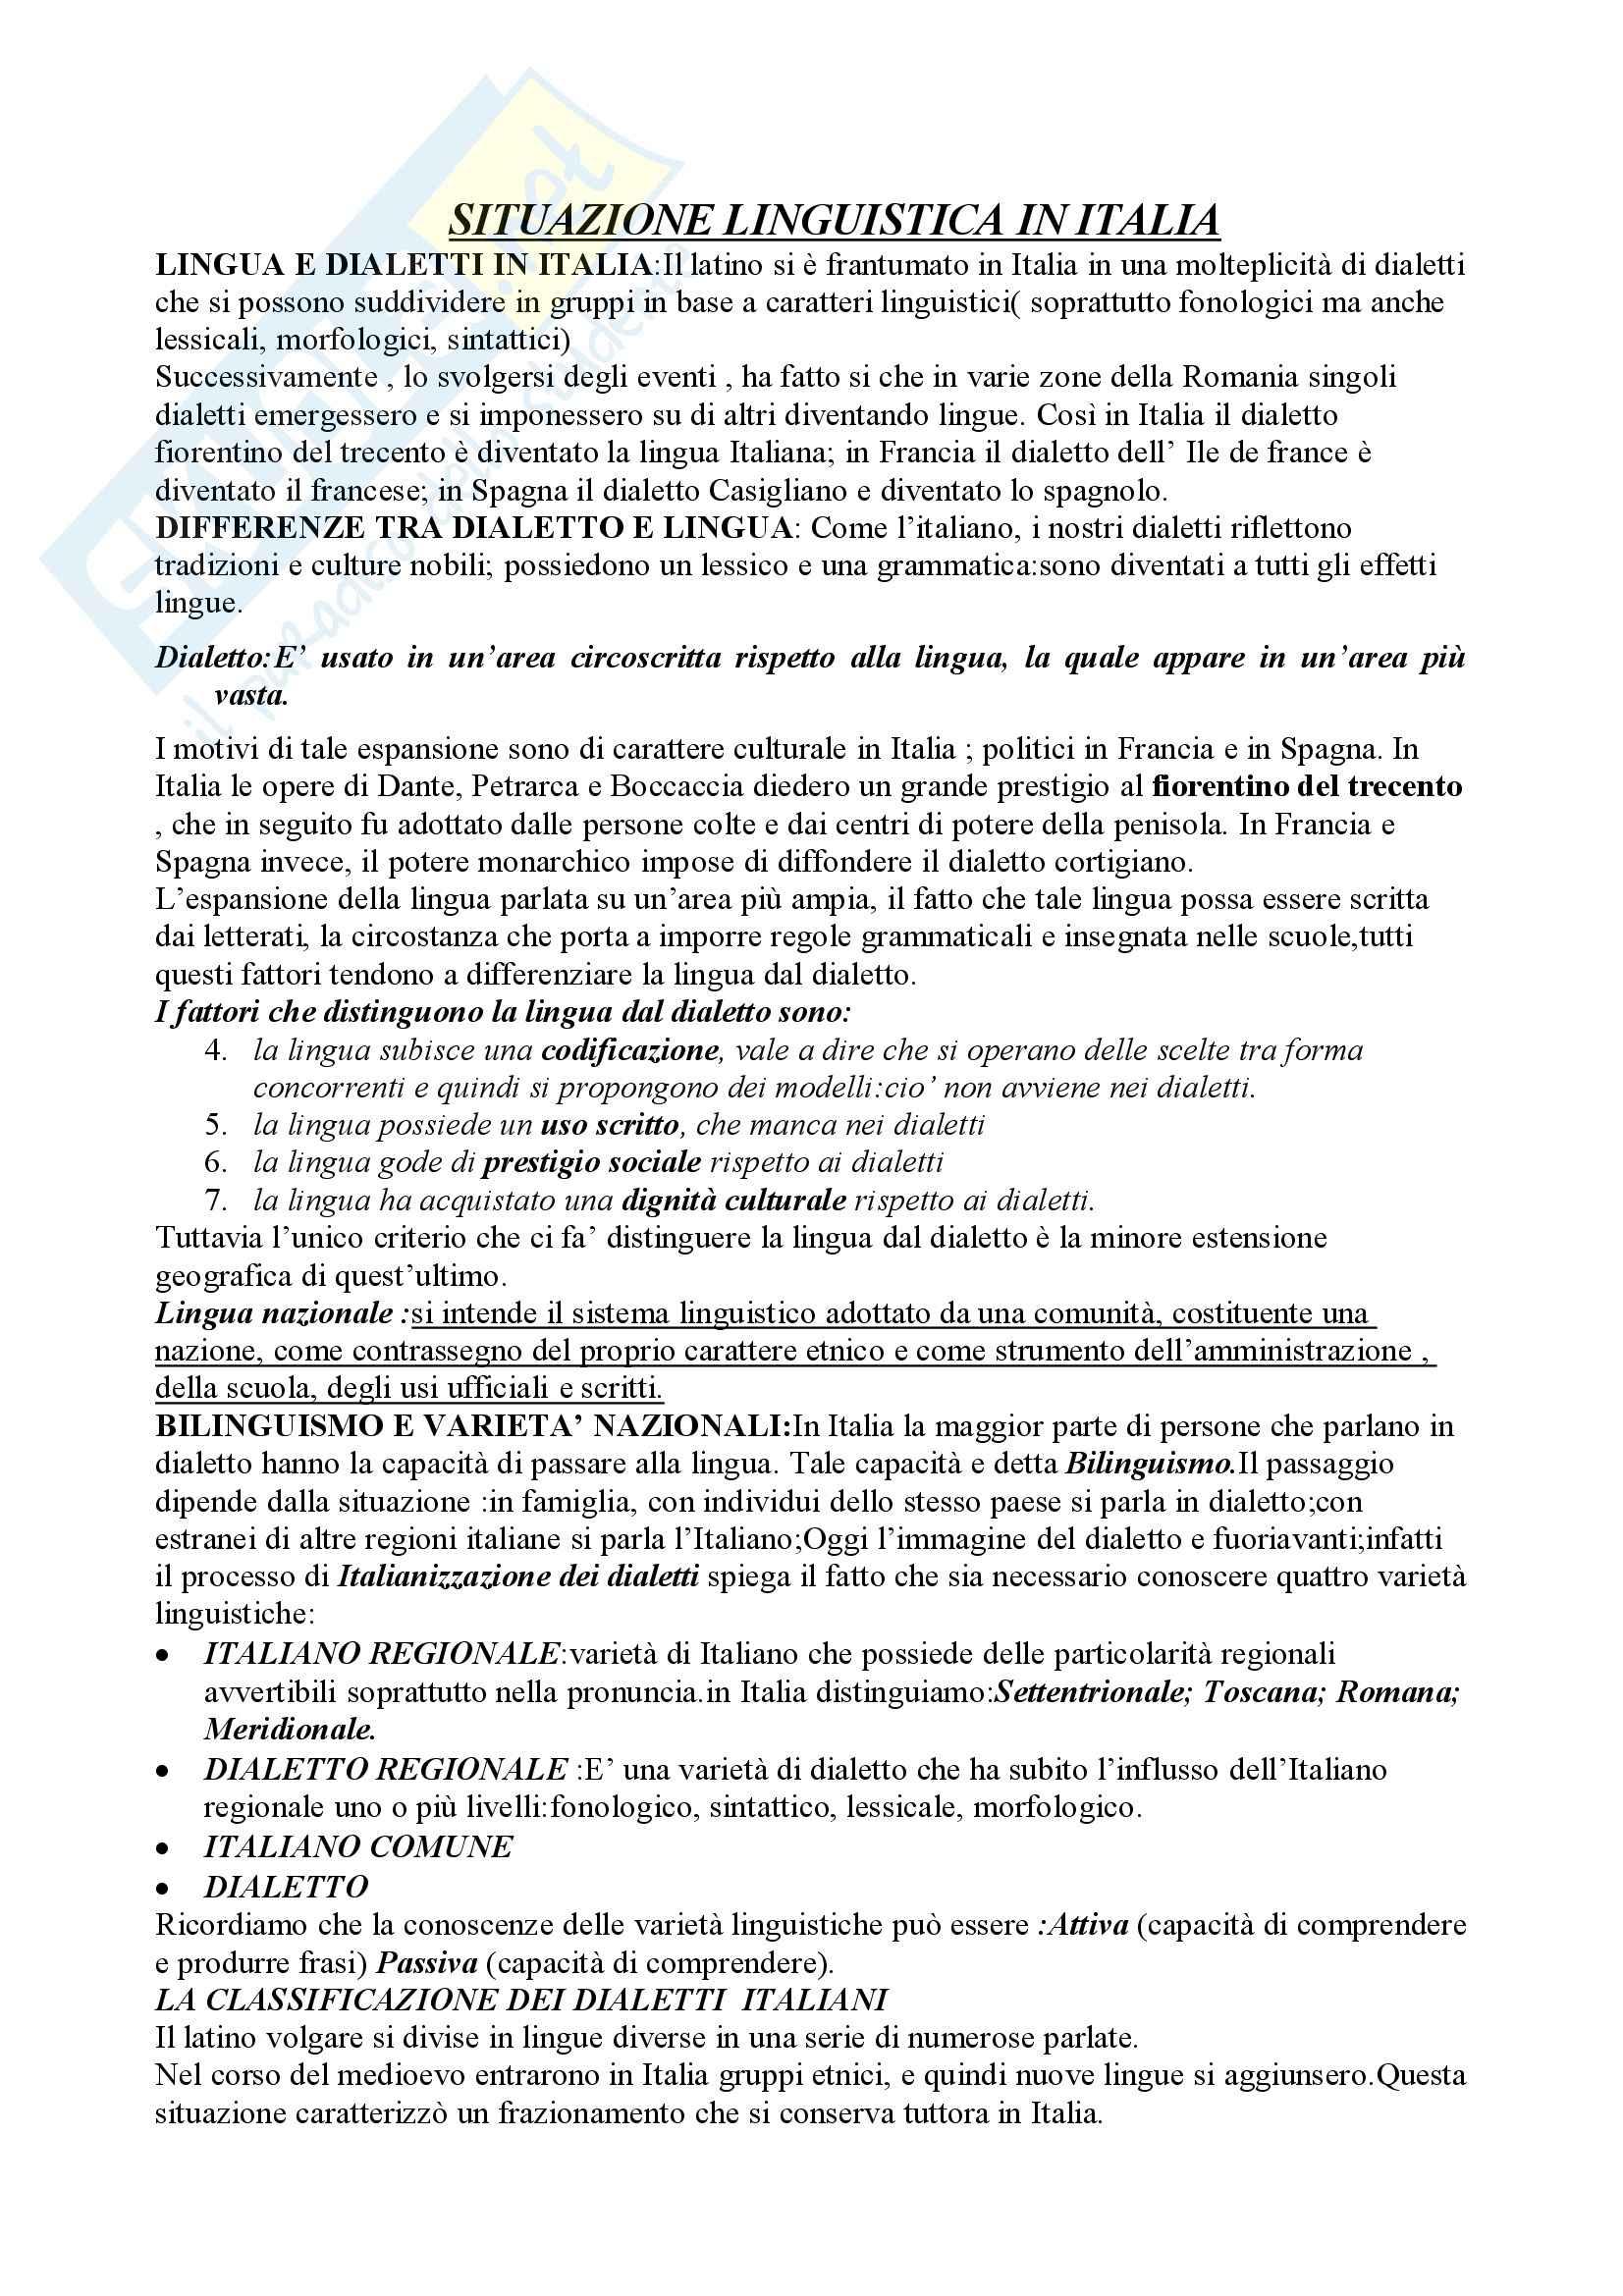 Linguistica Italiana - Appunti Pag. 21